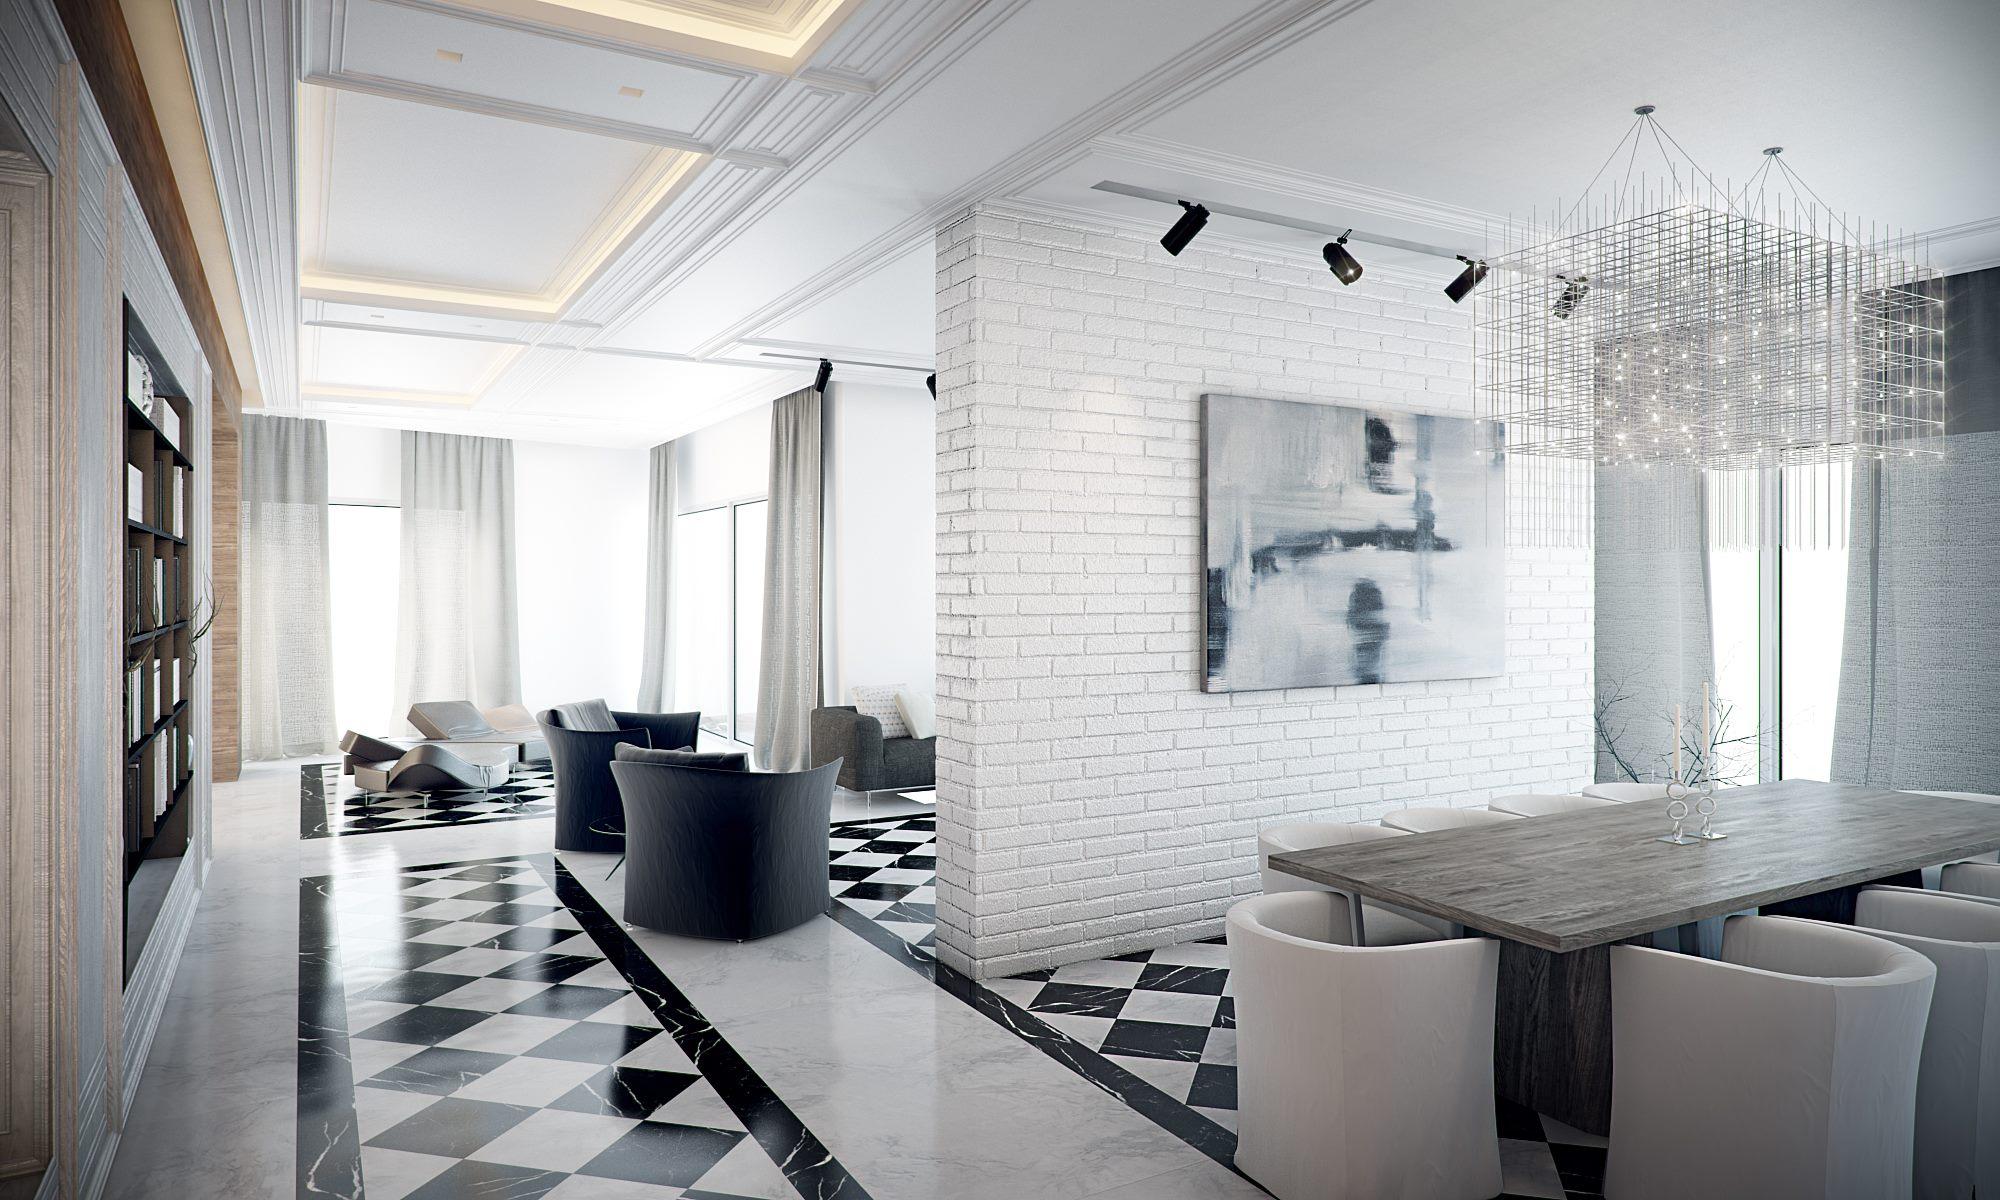 UAE Tiles